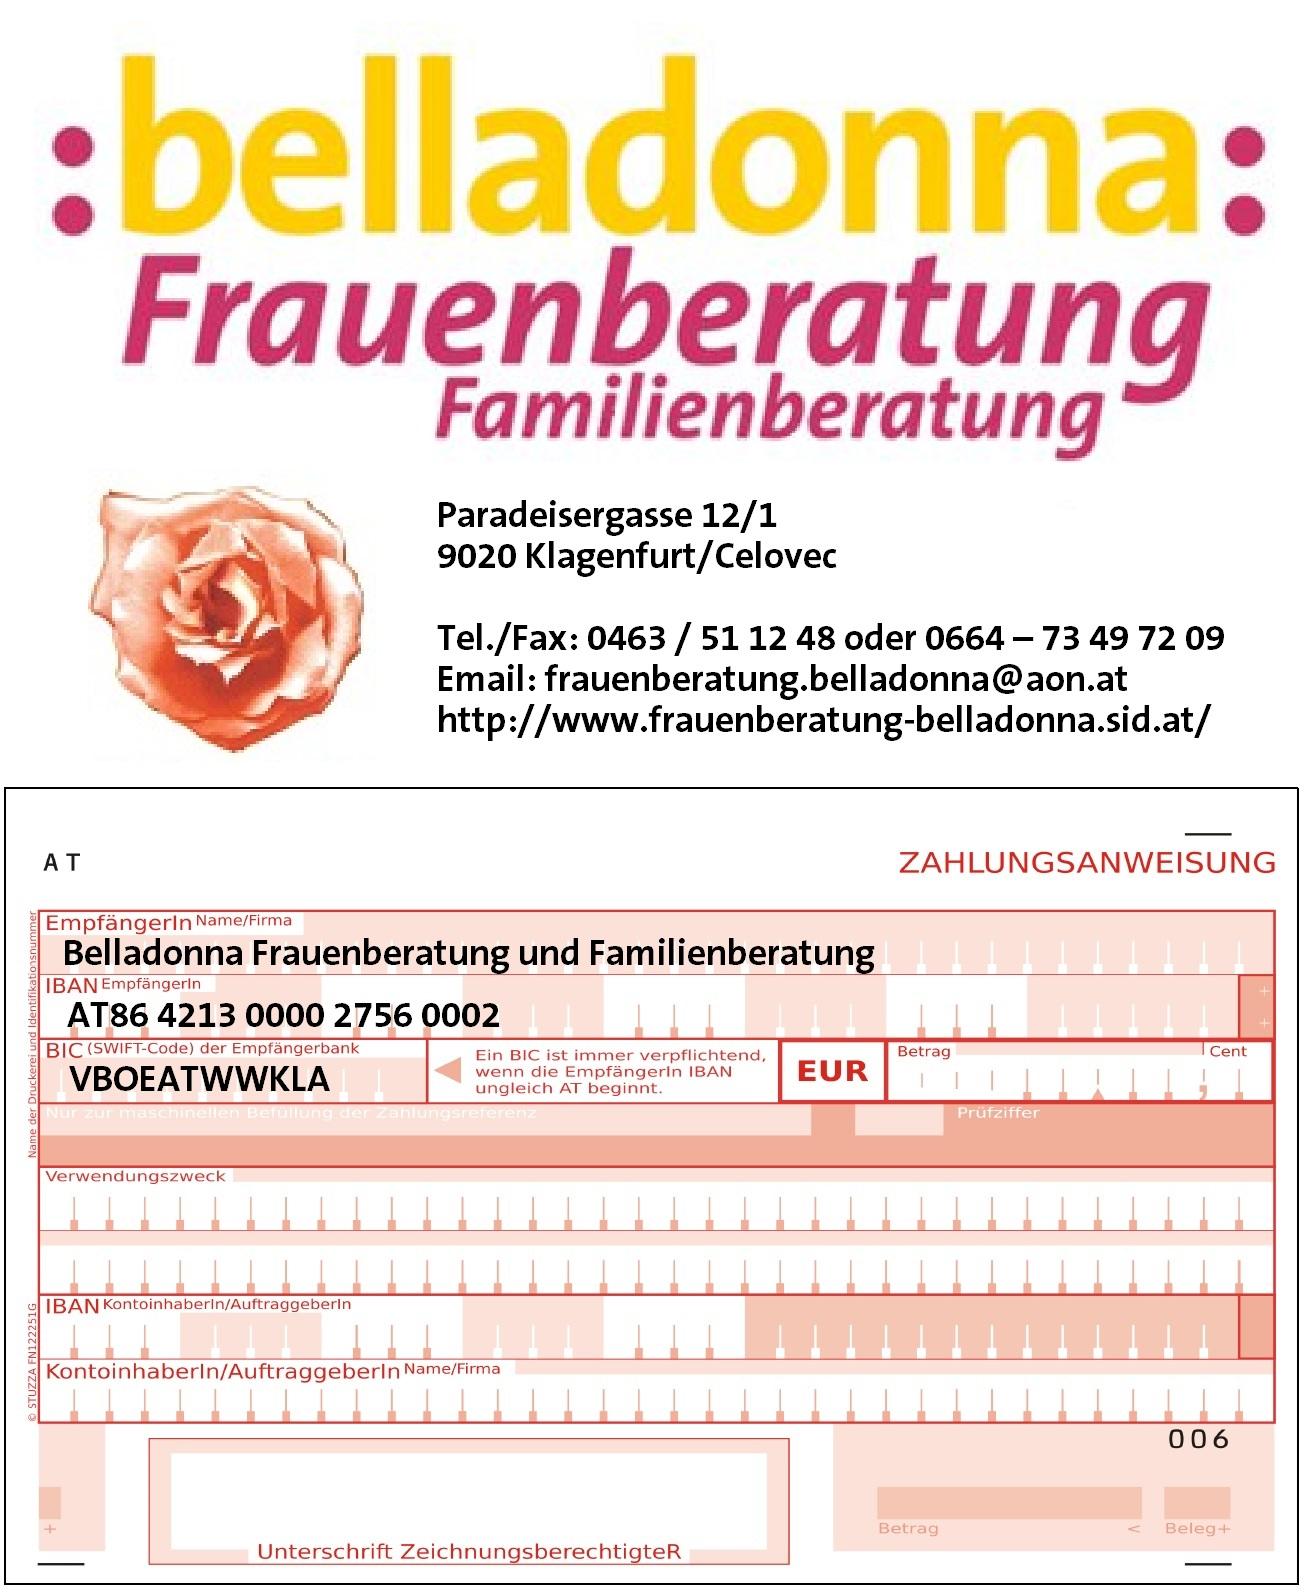 SEPA-Zahlungsanweisung